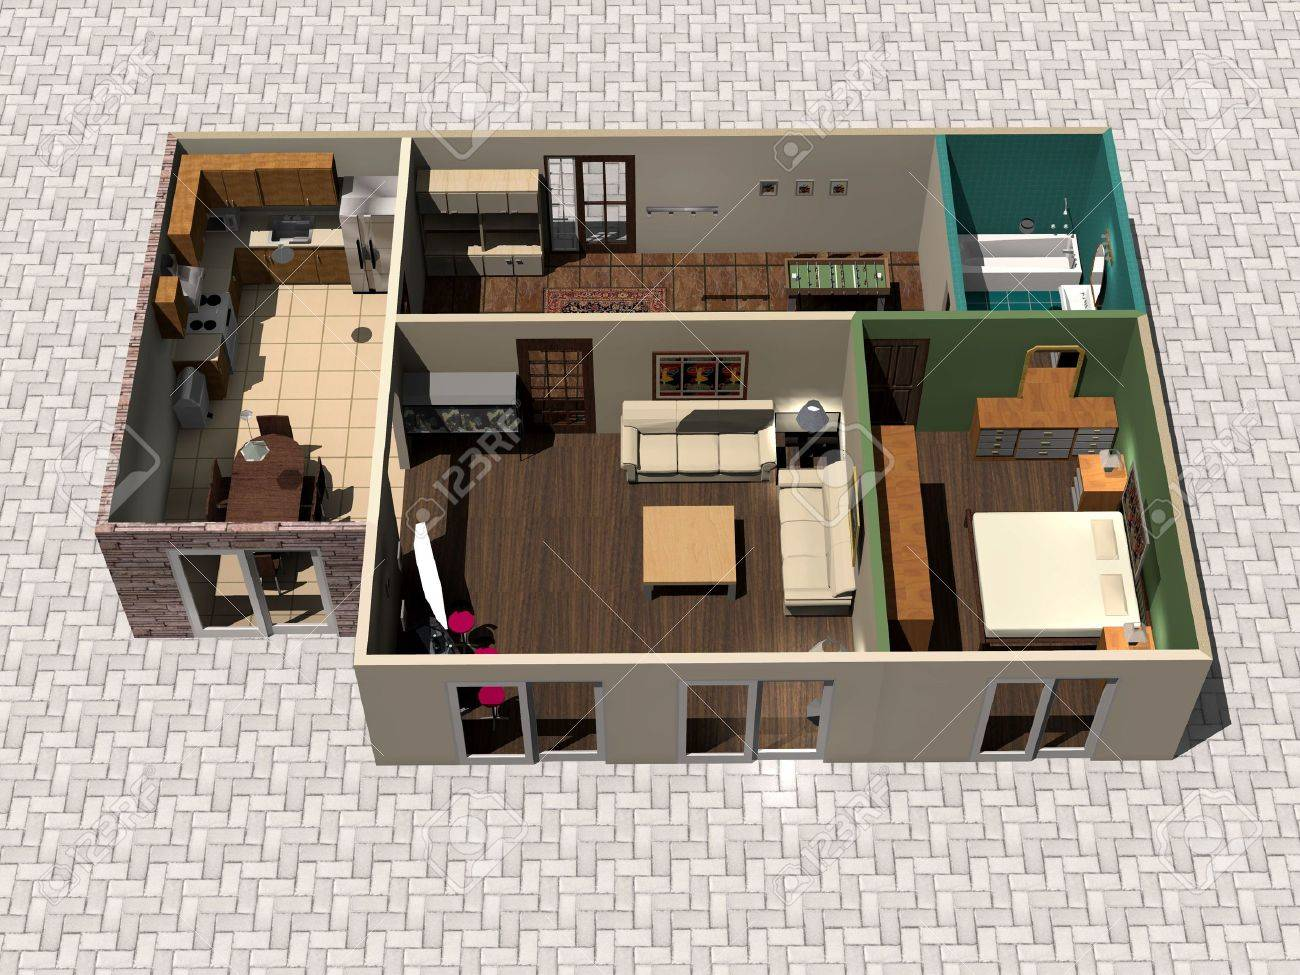 3D-Haus-Plan Lizenzfreie Fotos, Bilder Und Stock Fotografie. Image ... size: 1300 x 974 post ID: 3 File size: 0 B